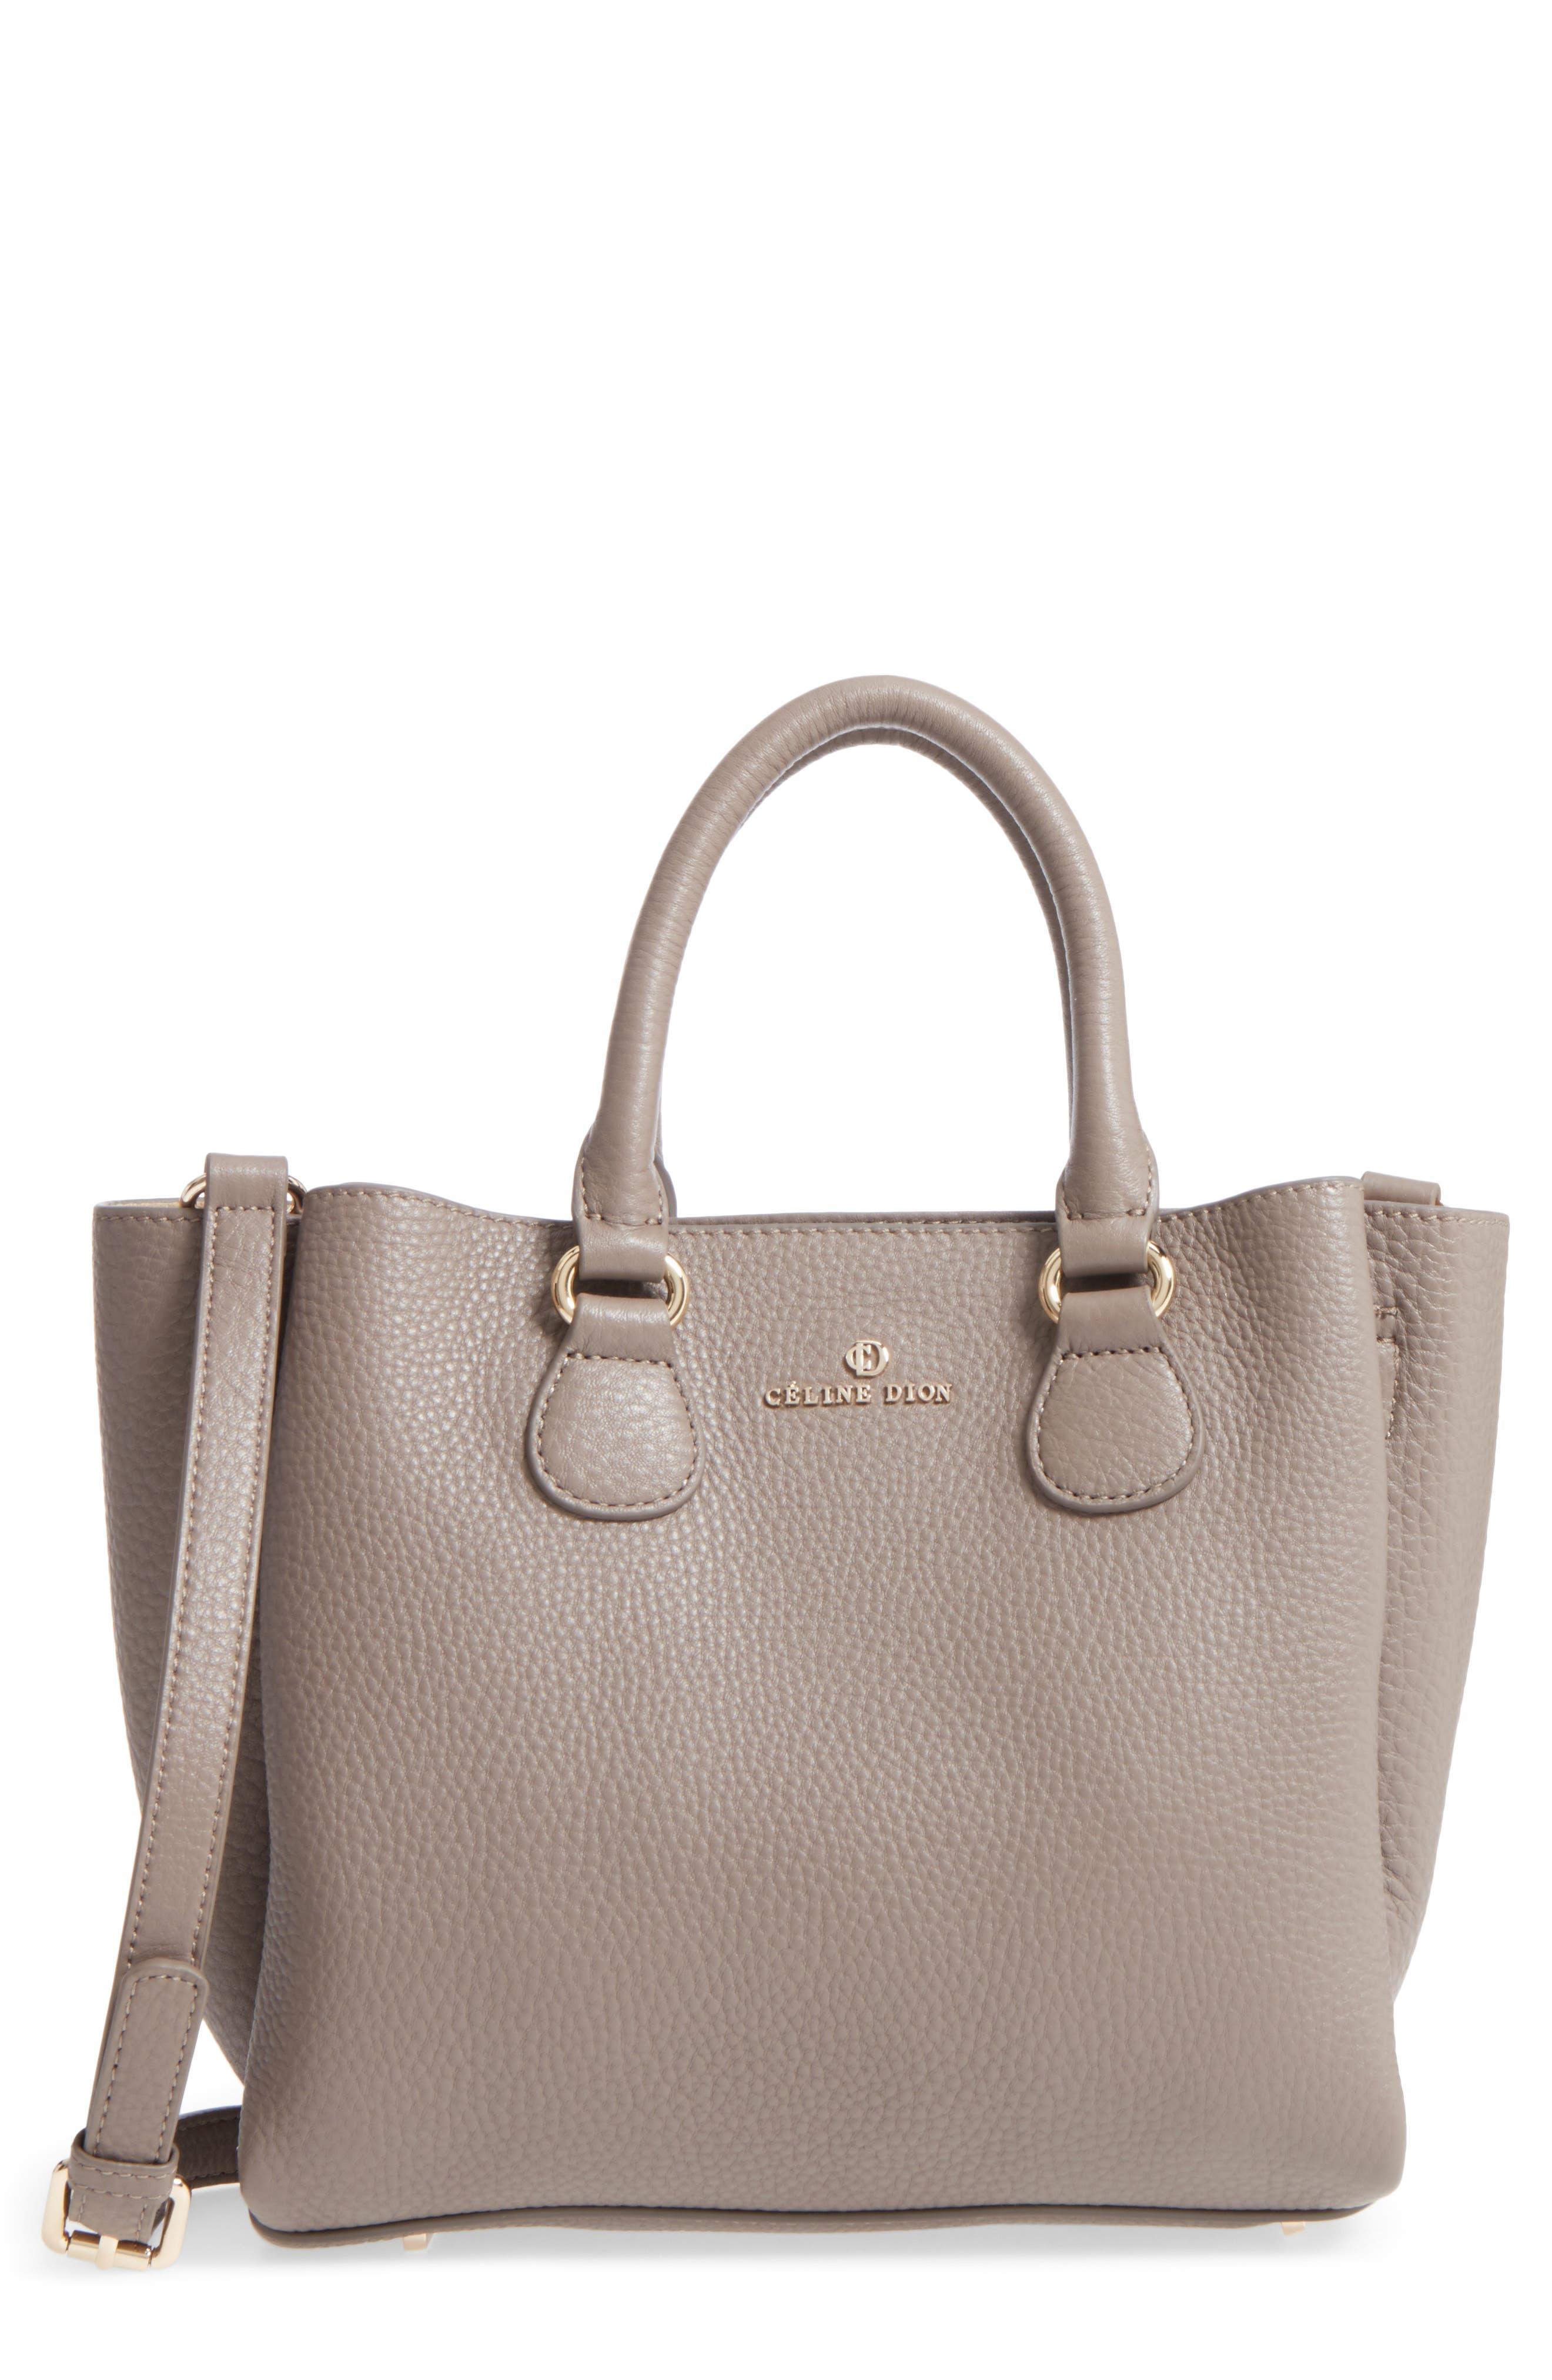 Céline Dion Small Adagio Leather Satchel